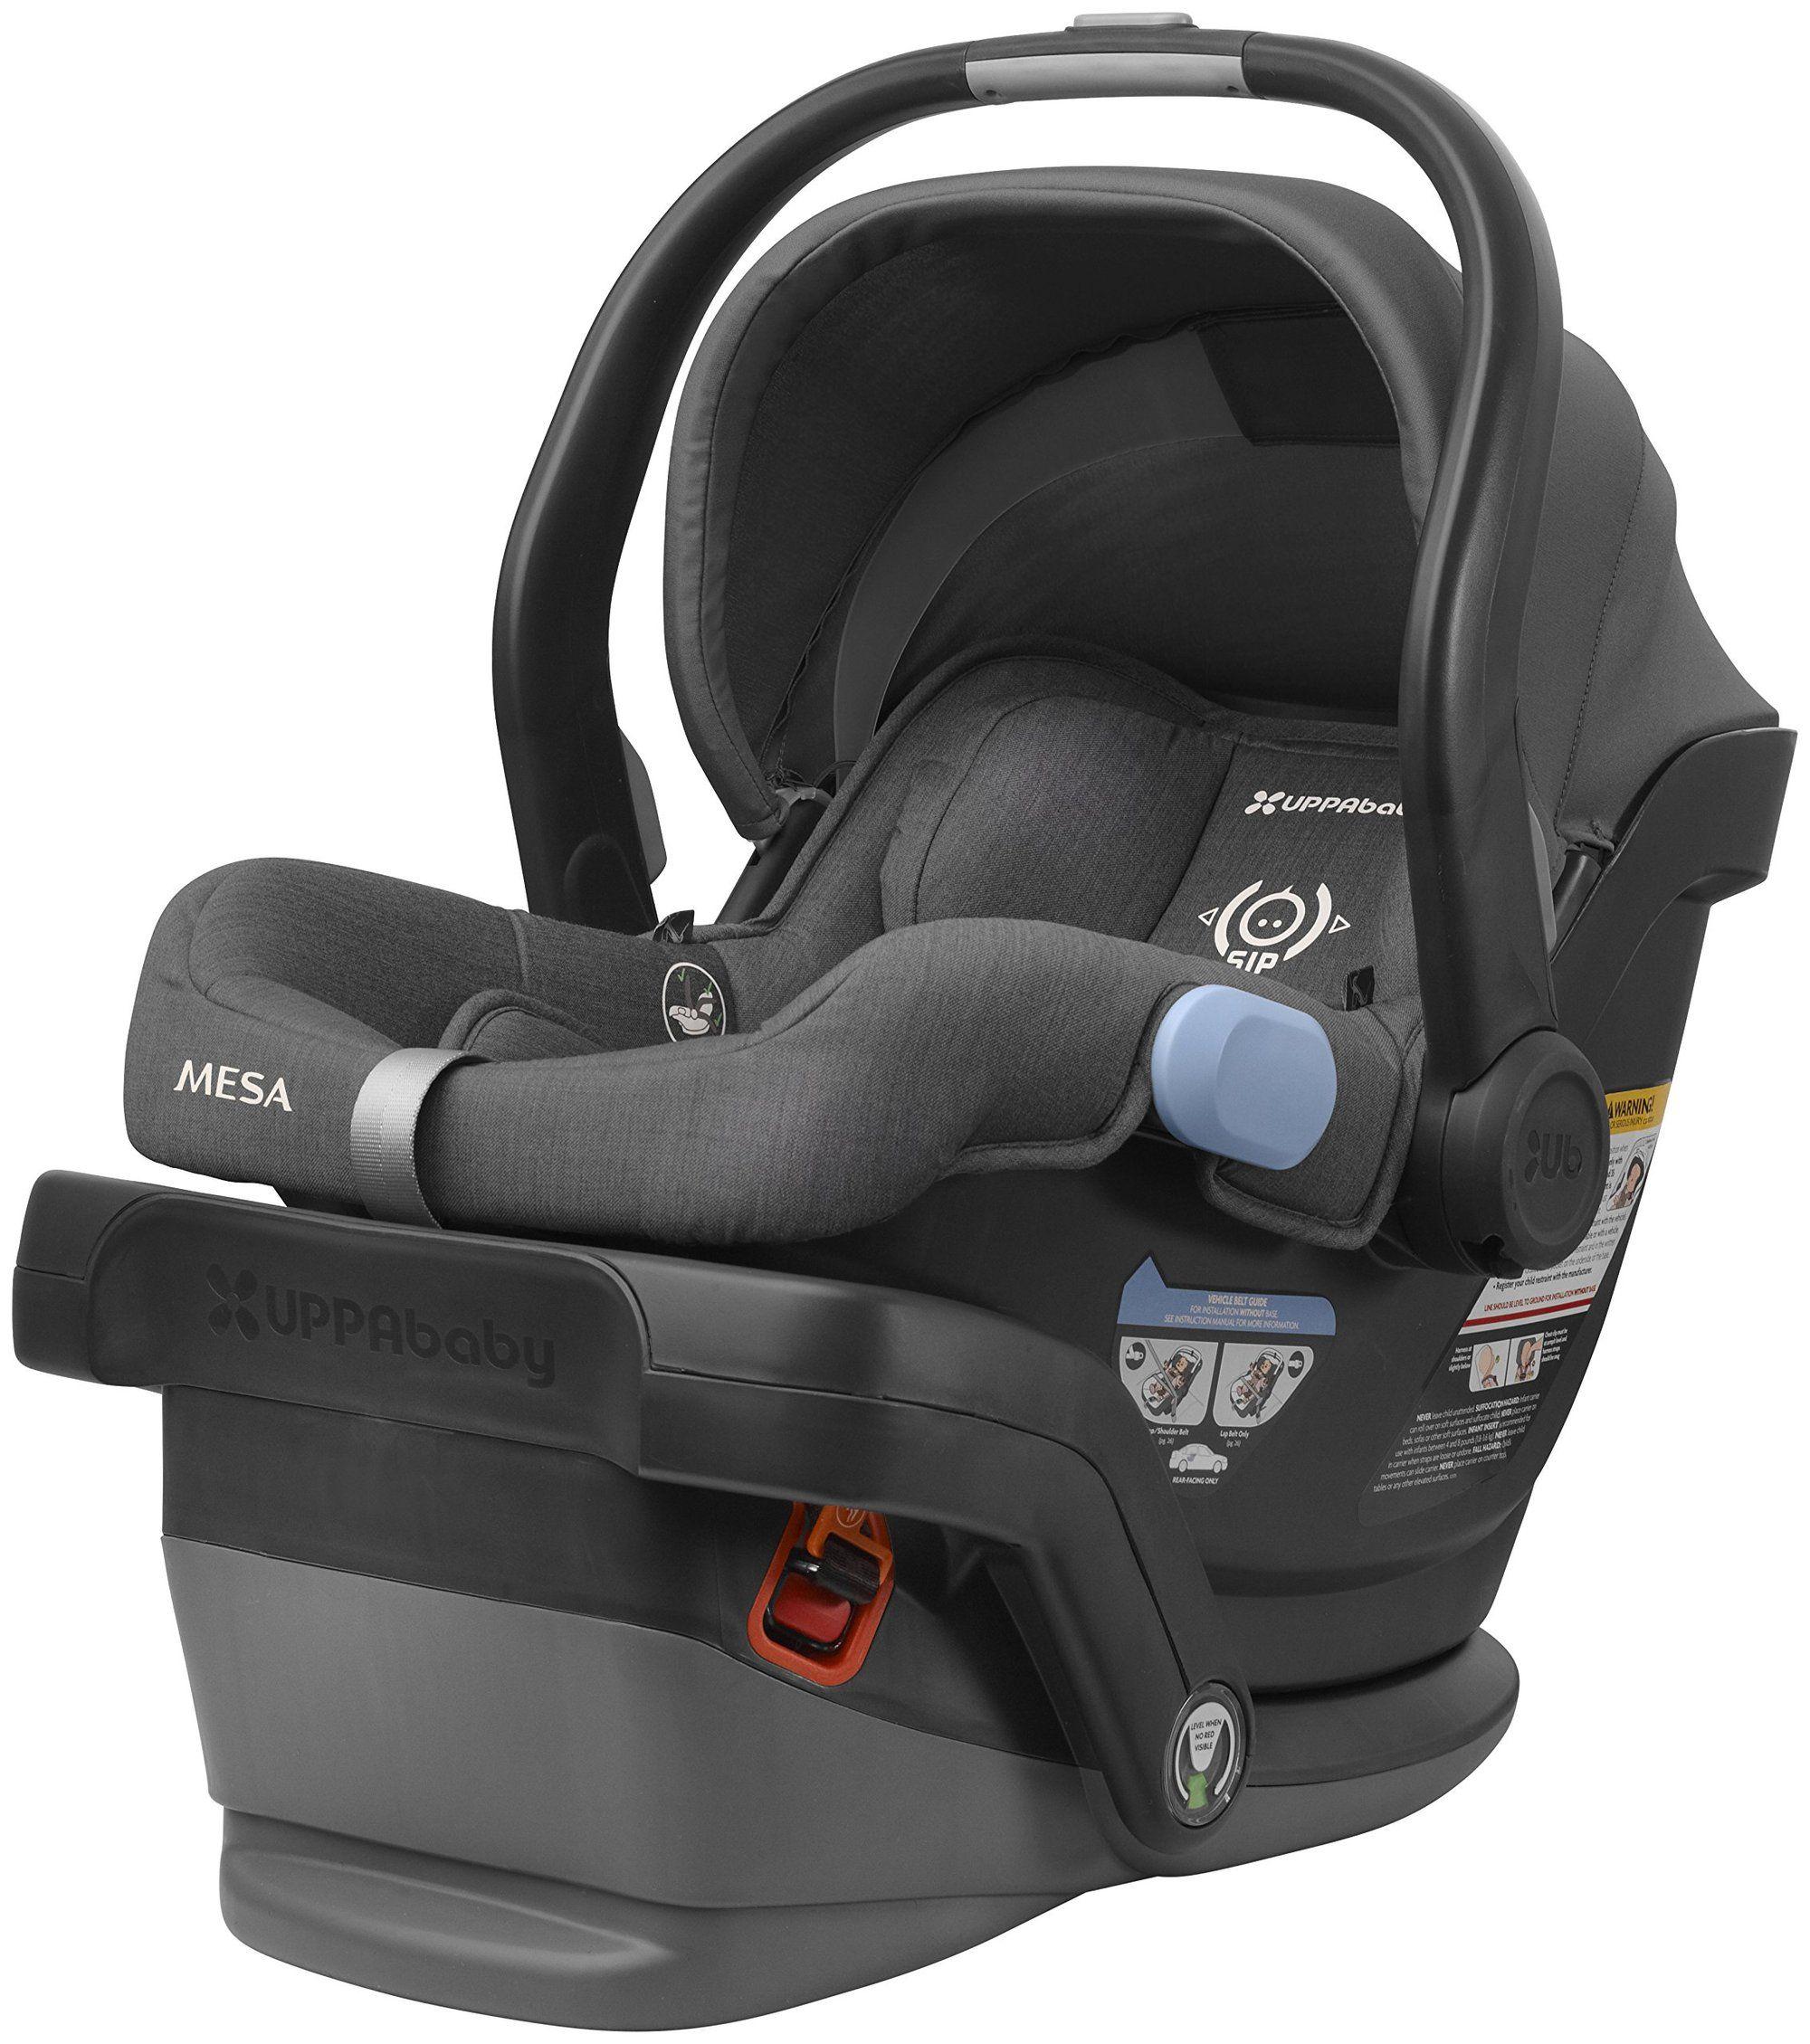 2018 UPPAbaby MESA Infant Car Seat Jordan (Charcoal